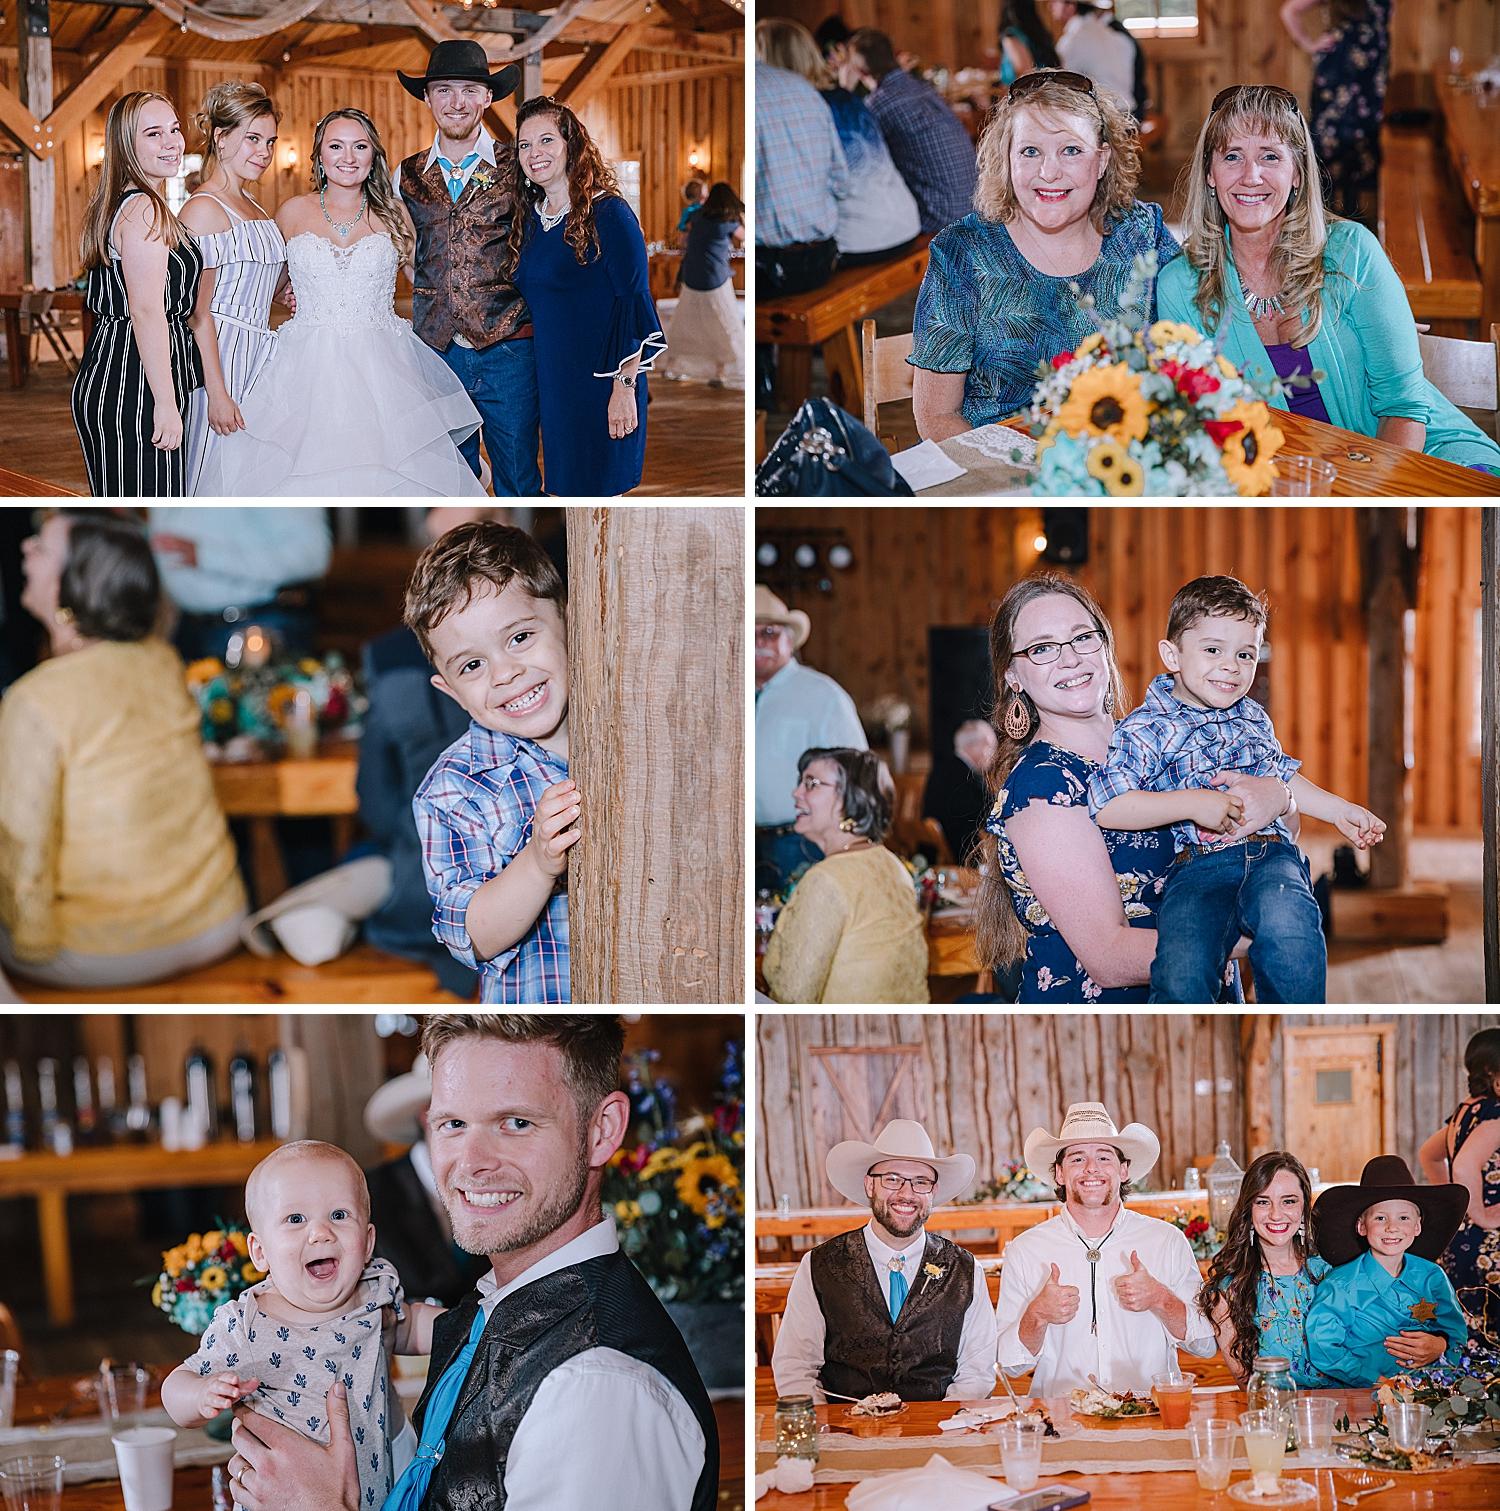 Carly-Barton-Photography-Old-Town-Texas-Rustic-Wedding-Photos-Sunflowers-Boots-Kyle-Texas_0078.jpg